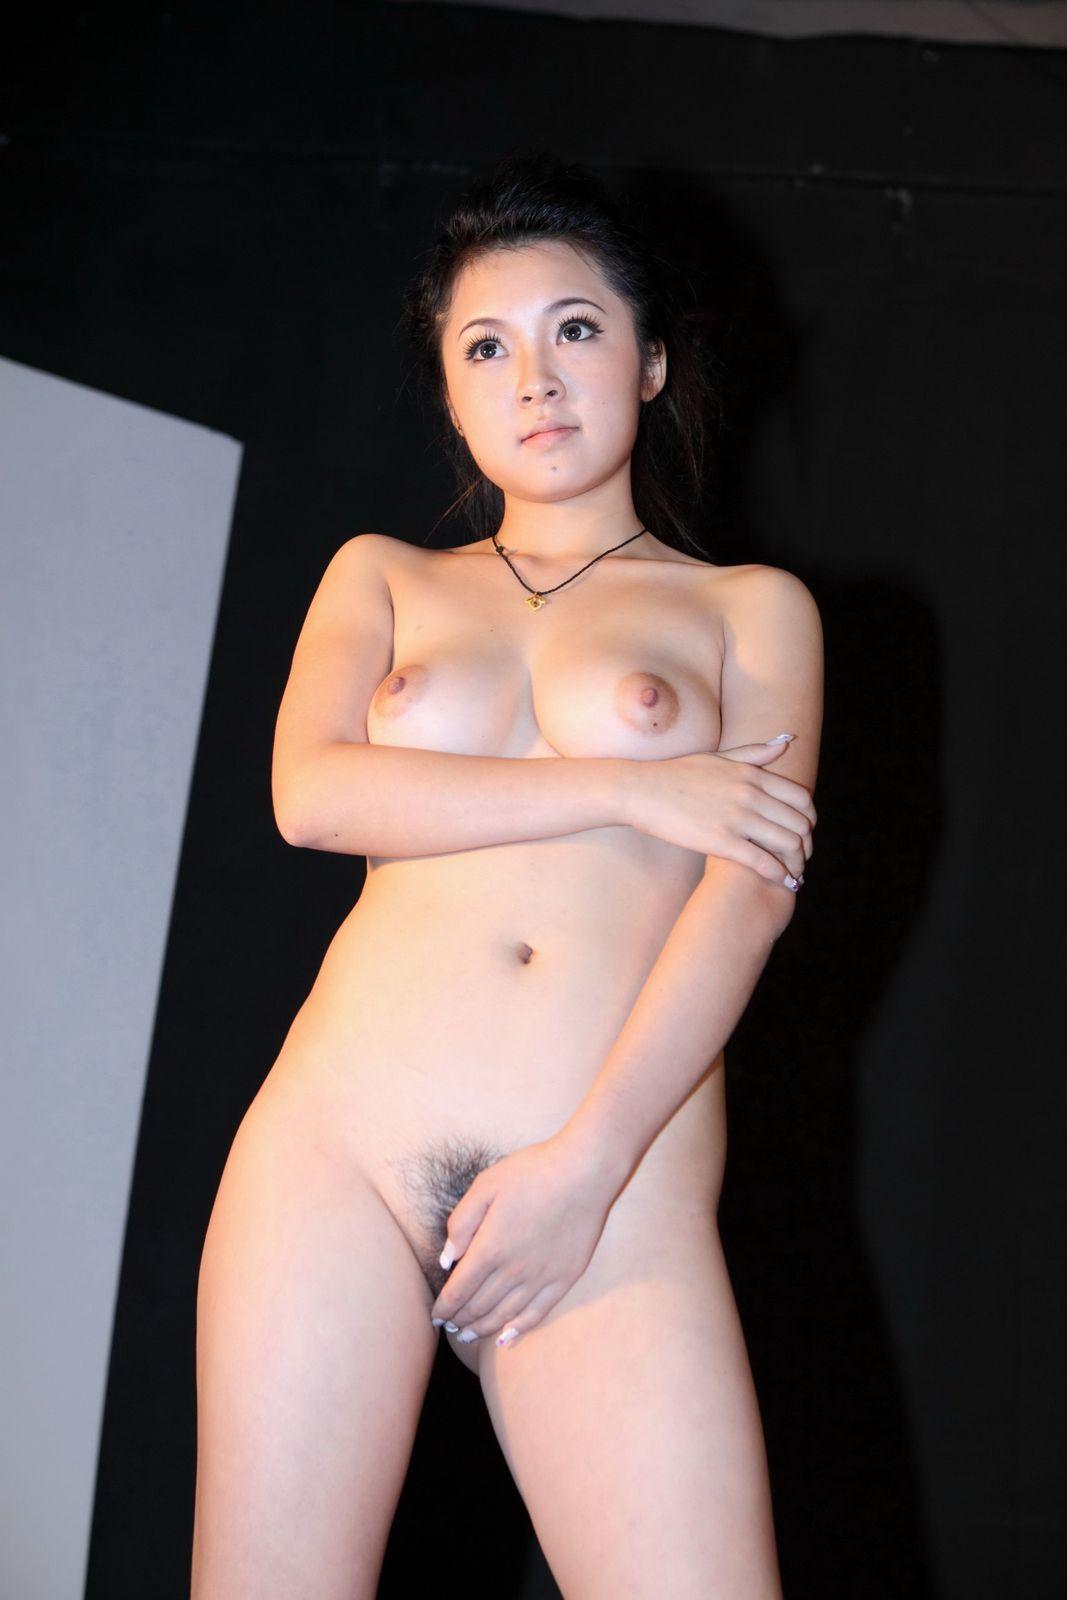 Nude Pinay Artist Nude Scenes